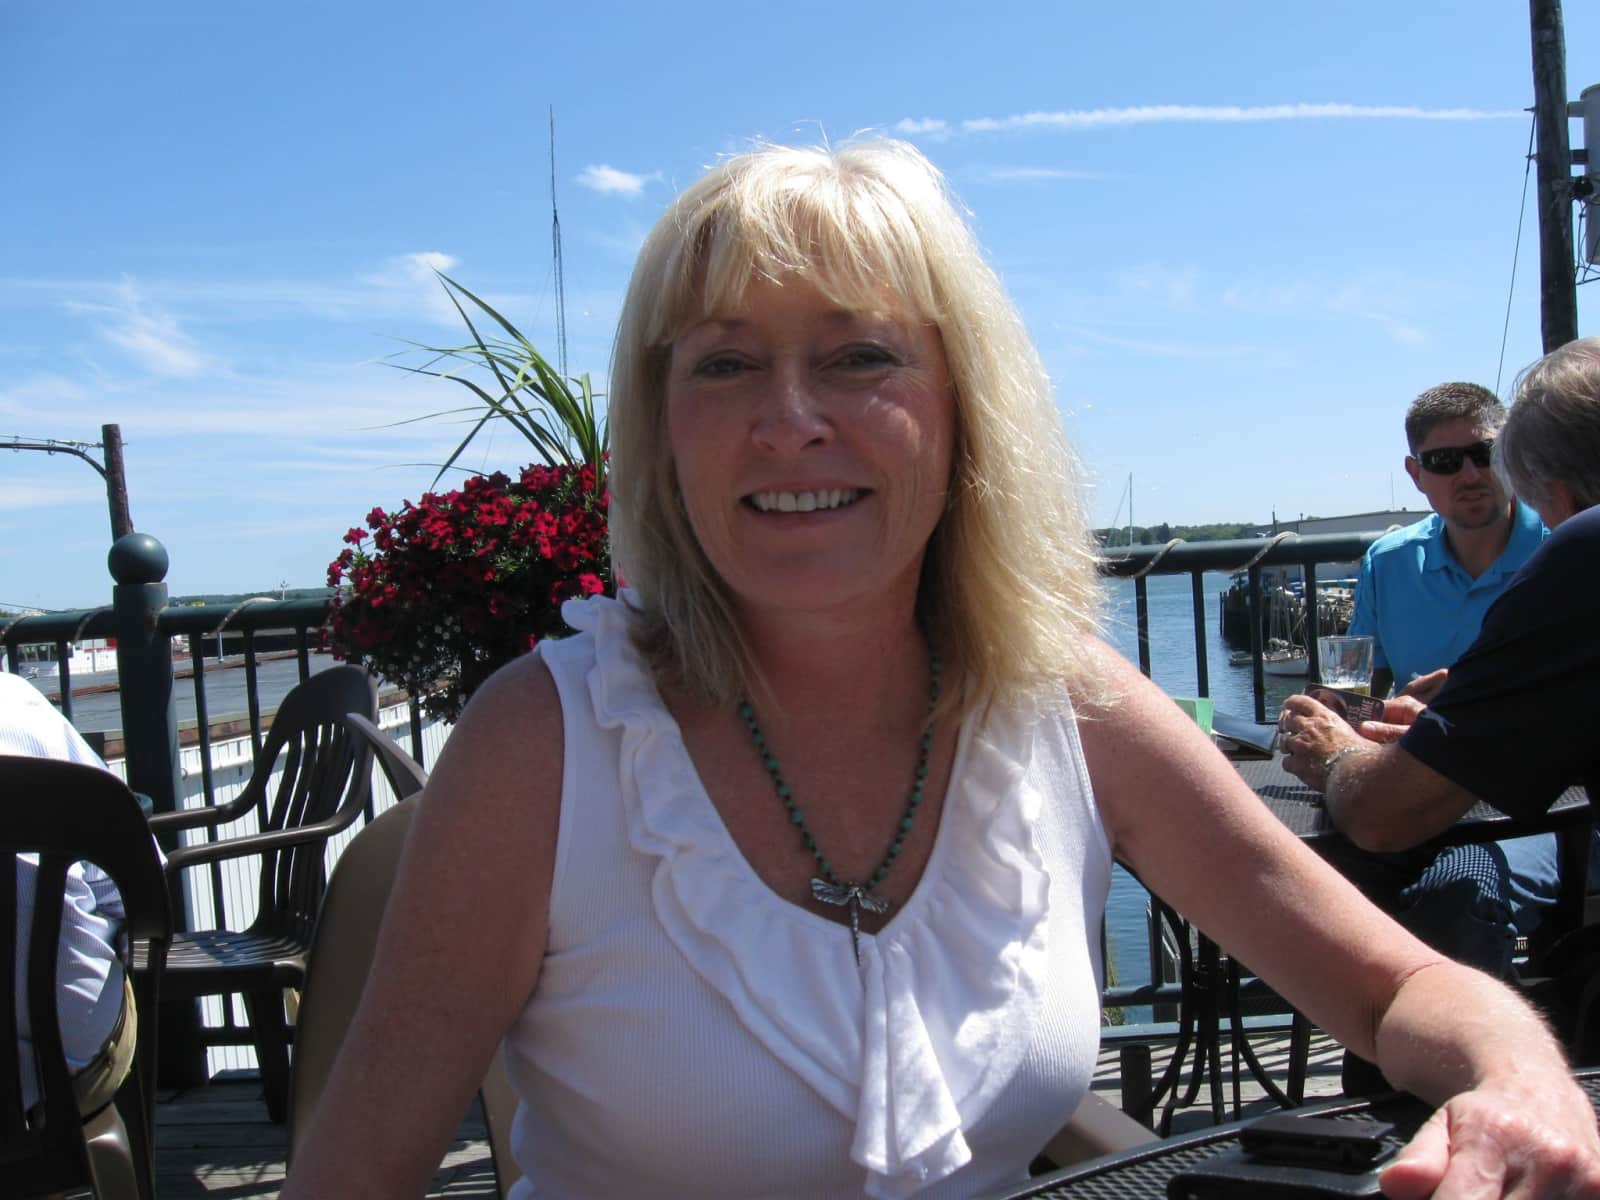 Margie from Indianapolis, Indiana, United States